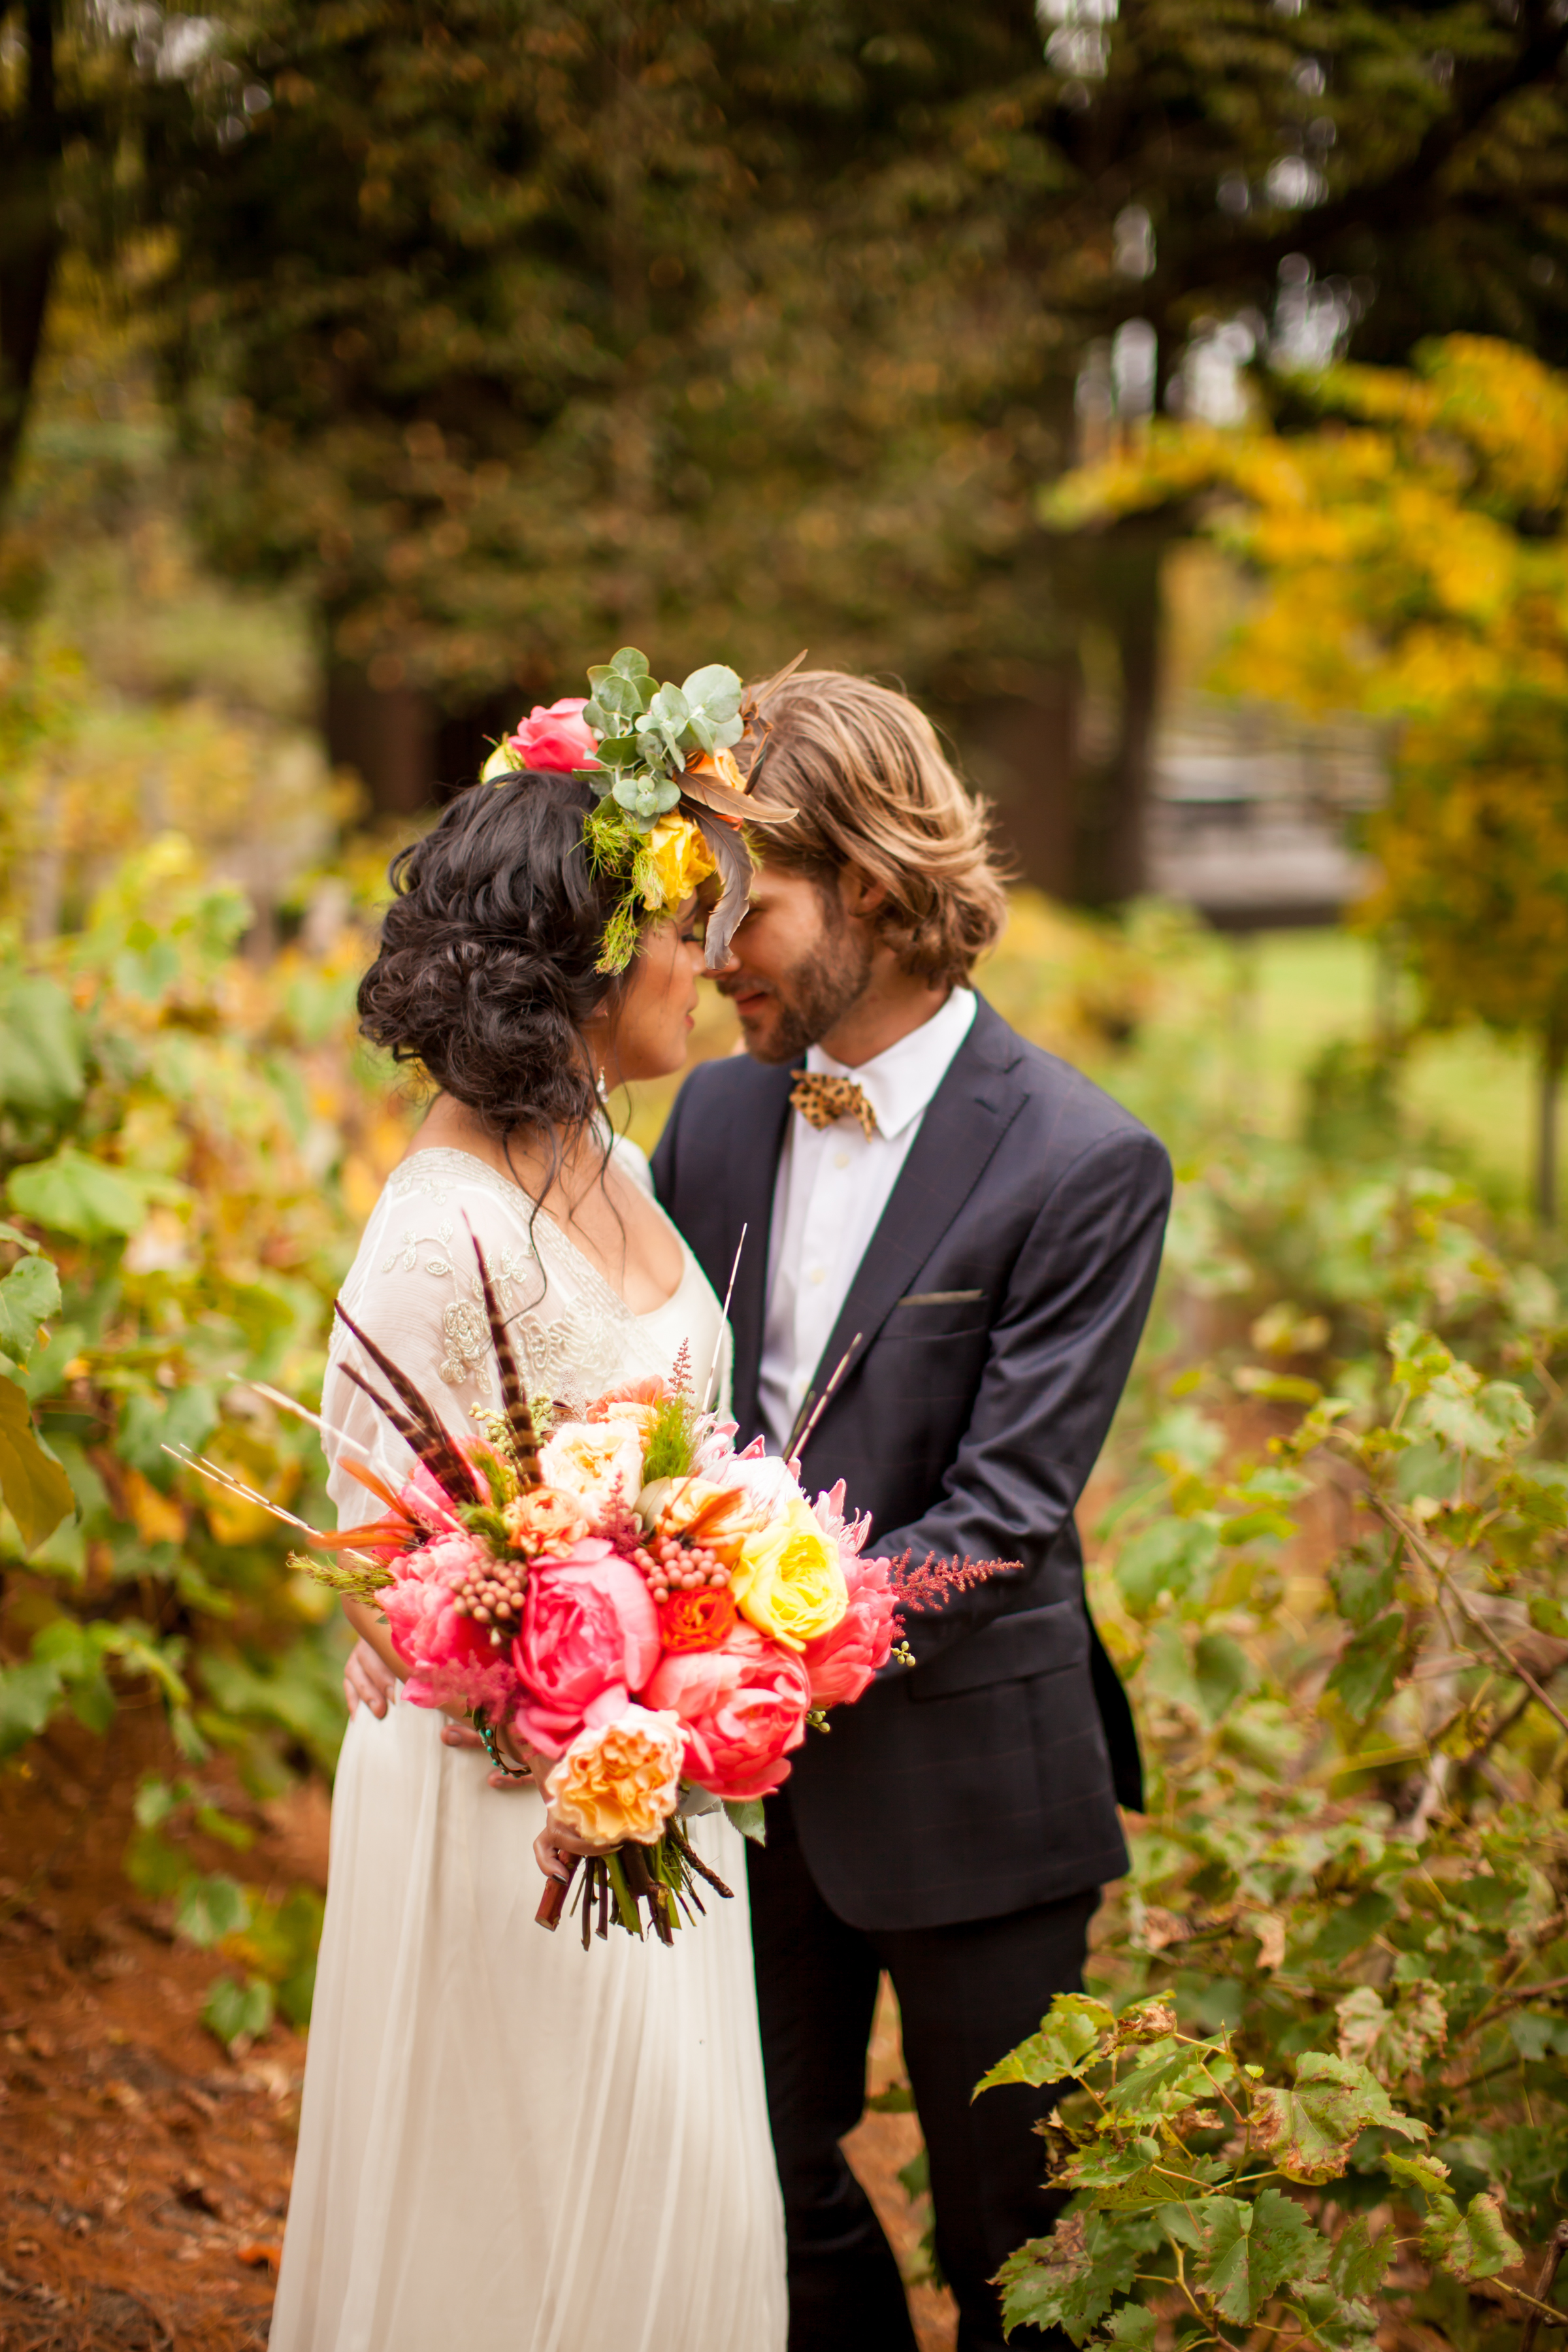 Southwestern inspired wedding